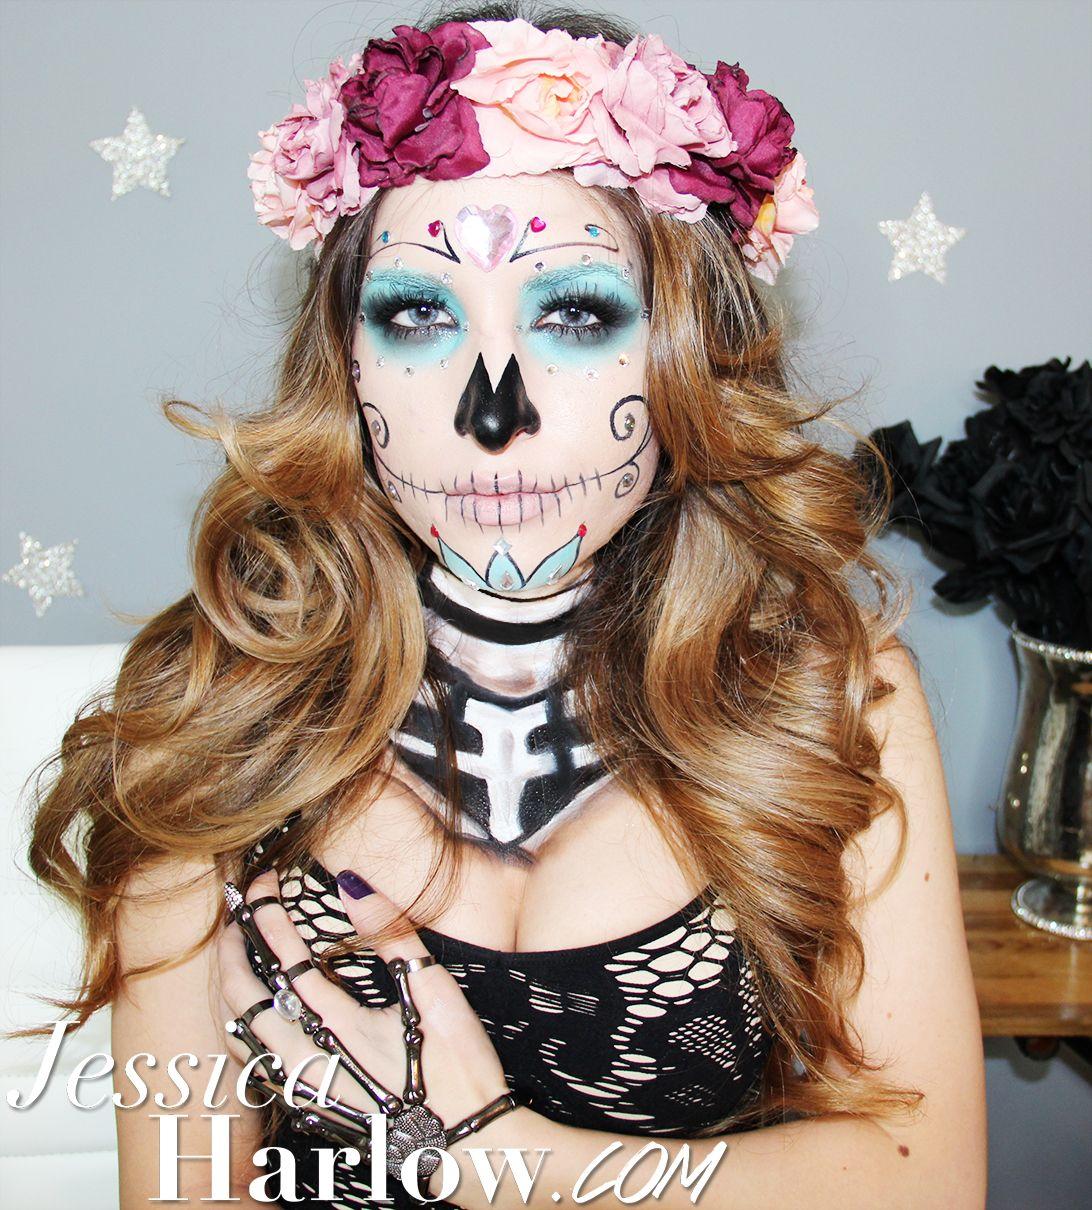 Sugar Skull Halloween Costume Makeup http://www.youtube.com/watch ...